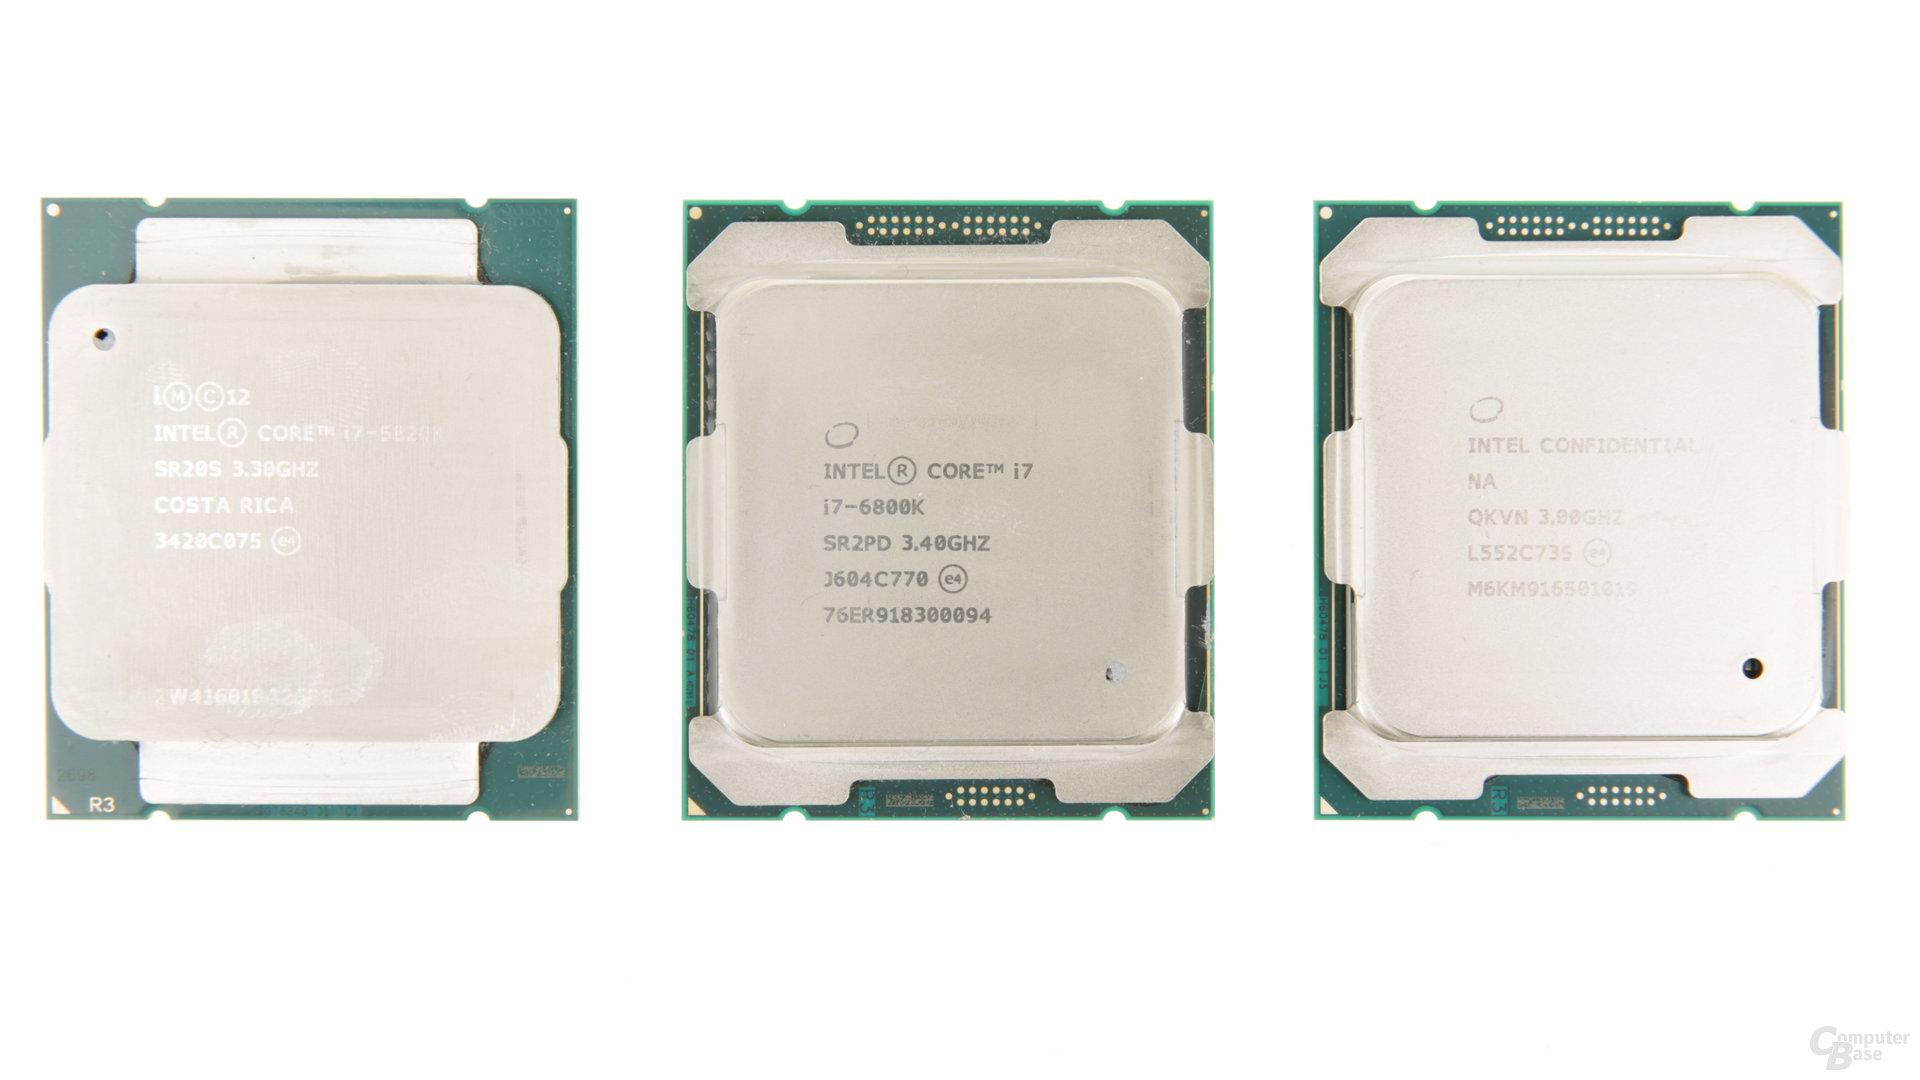 Intel Core i7-5820K (Haswell-E) und i7-6800K sowie i7-6950X (Broadwell-E)